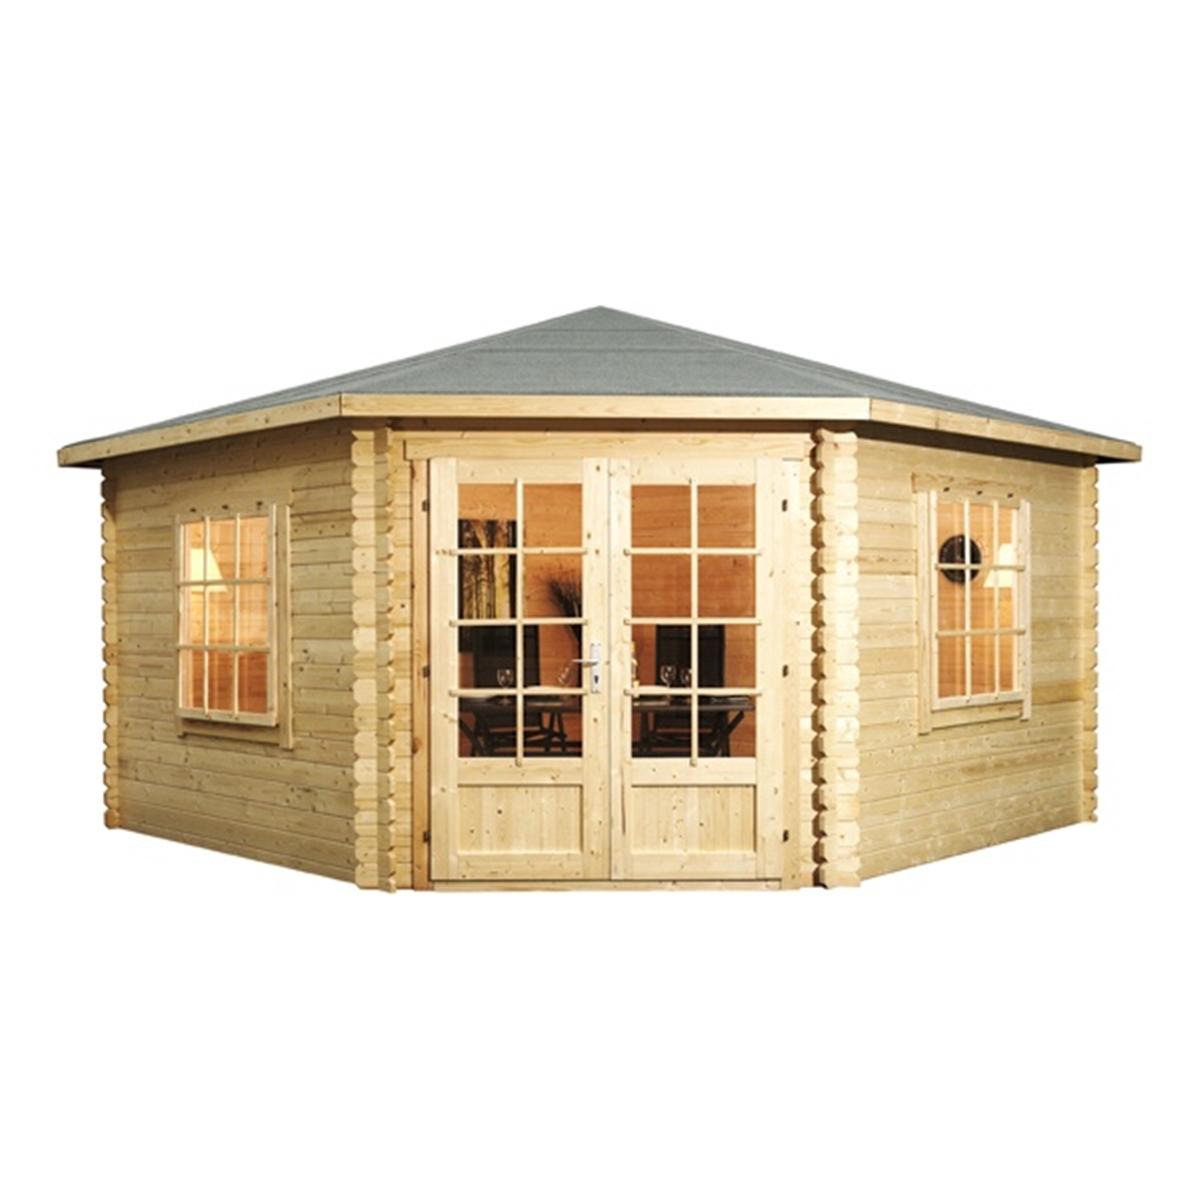 4m x 4m corner log cabin double glazing with large. Black Bedroom Furniture Sets. Home Design Ideas